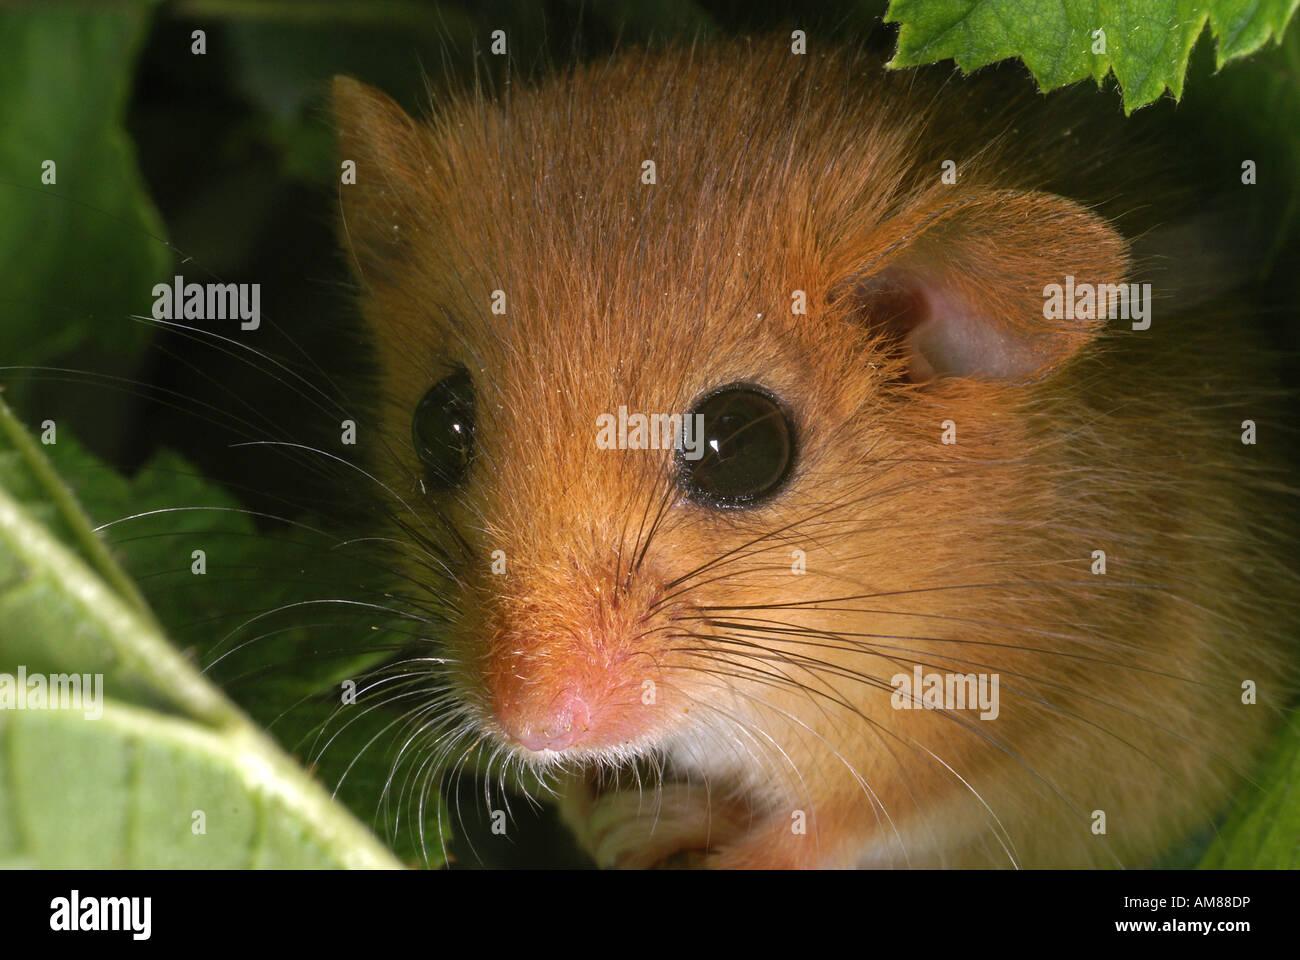 Hazel ghiro (Muscardinus avellanarius) Foto Stock